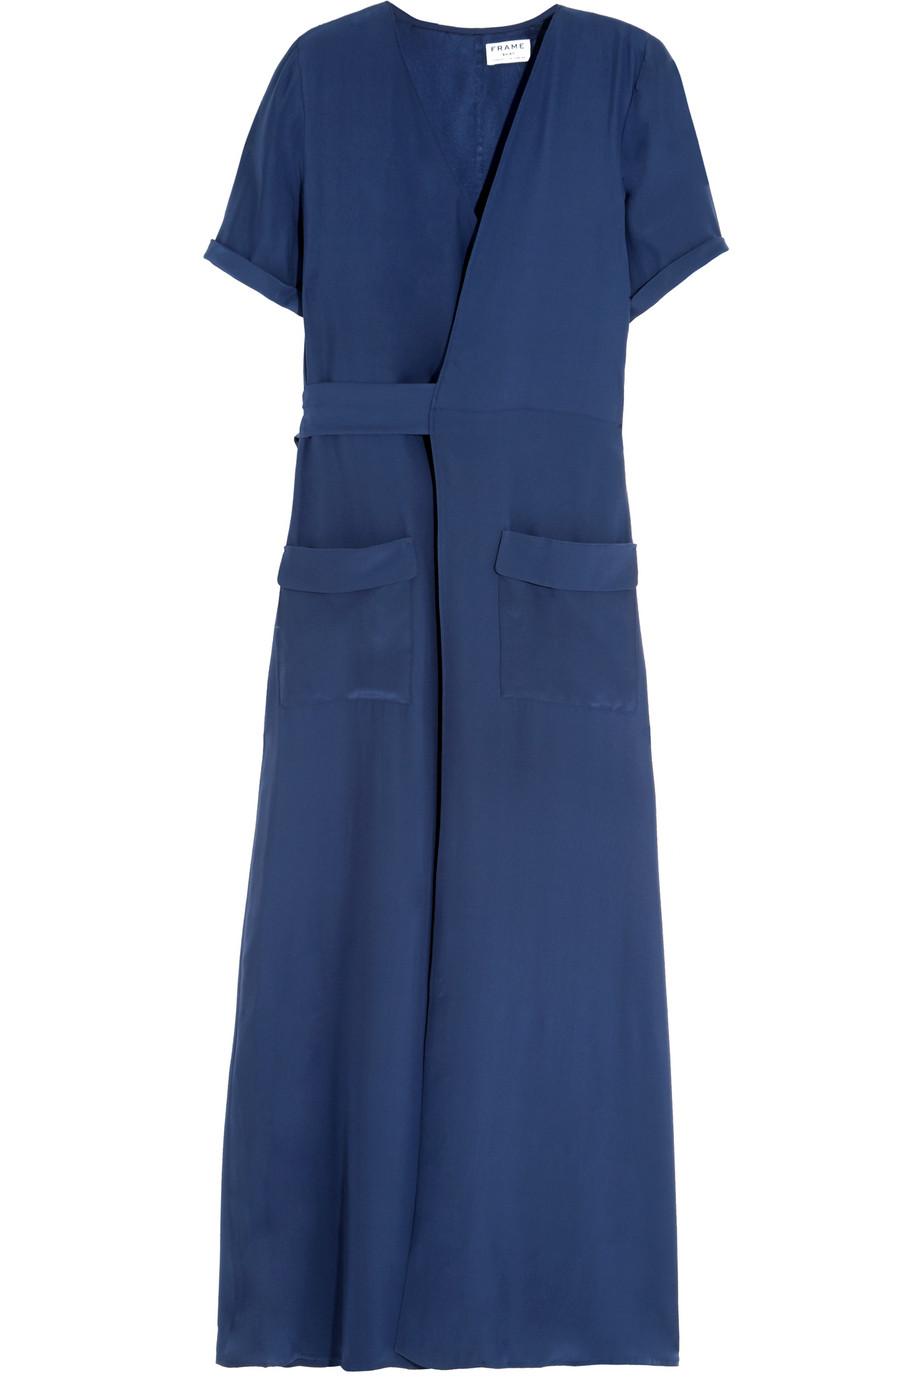 Le Wrap Silk-Charmeuse Maxi Dress, Storm Blue, Women's, Size: XS